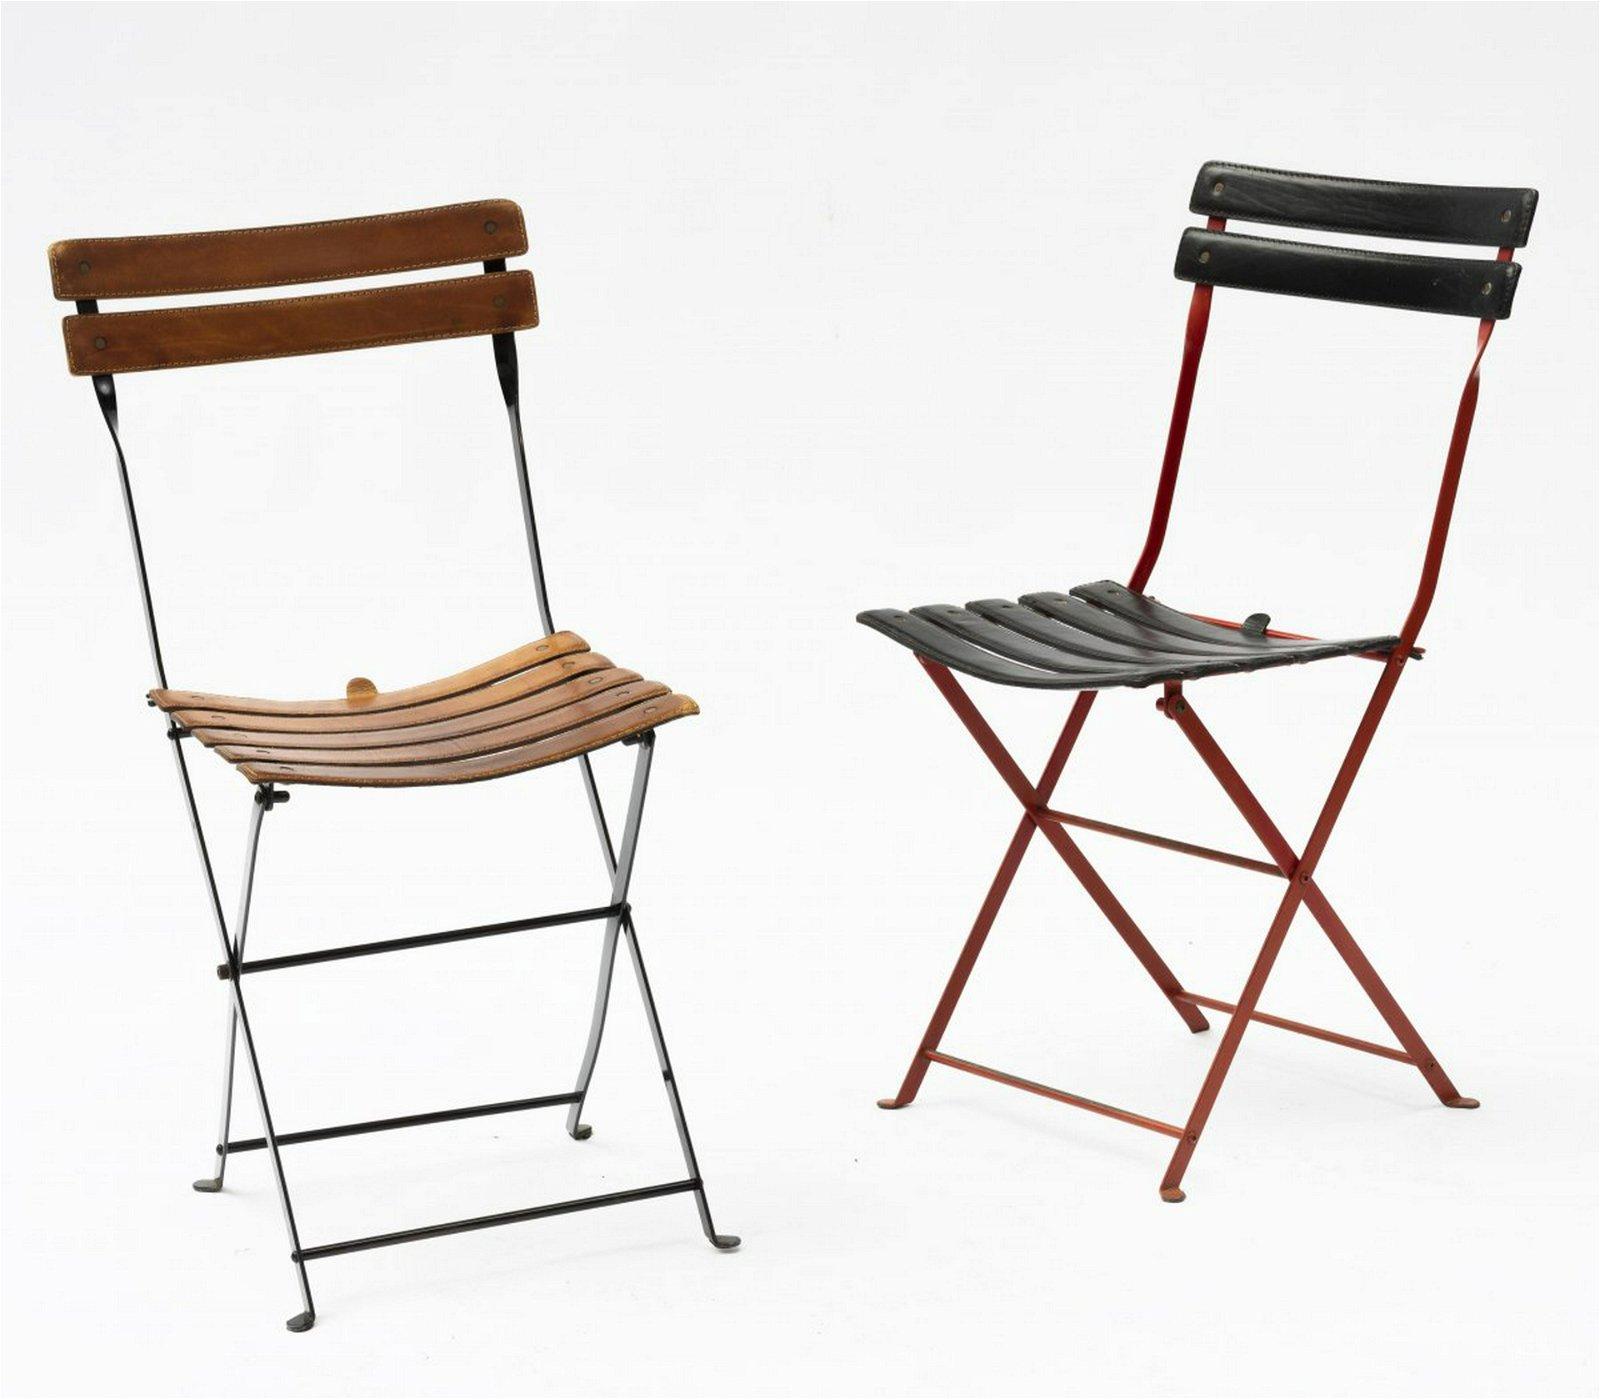 M. Zanuso, Two 'Celestina' folding chairs, 1978